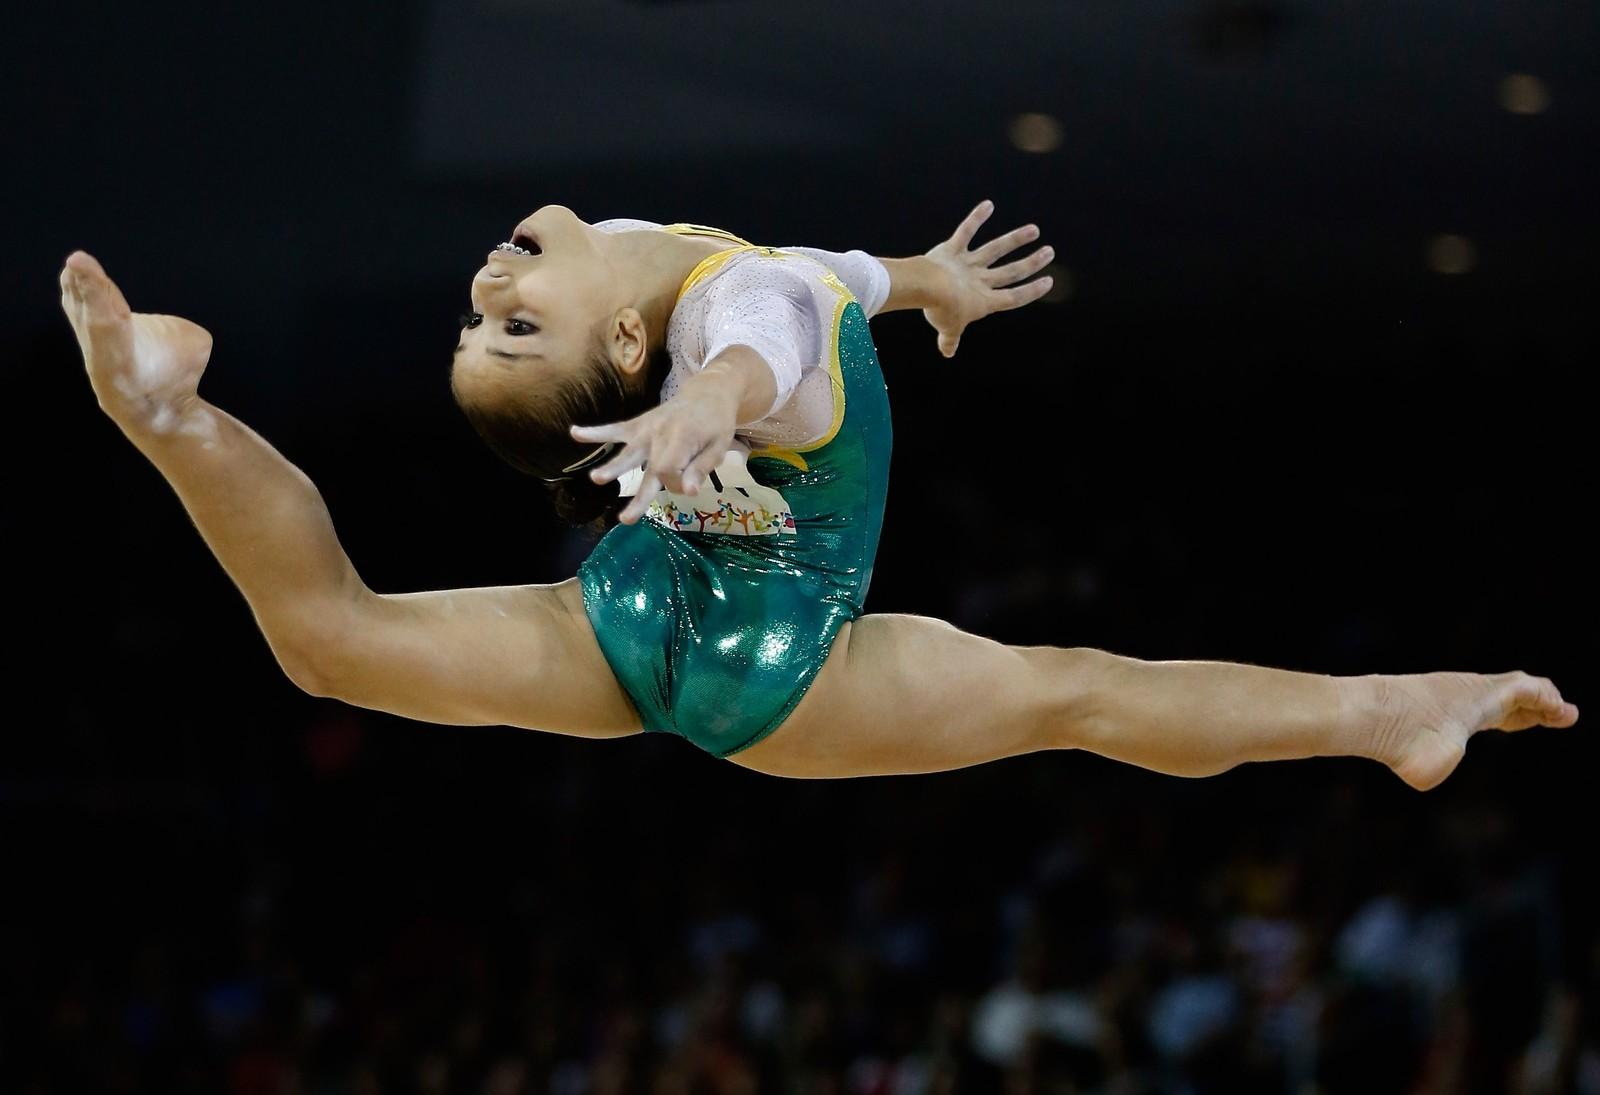 Brasilianske Flavia Lopes Saraiva i aksjon under finalen i gymnastikk i de samme lekene, som i år pågår i Toronto, Canada.